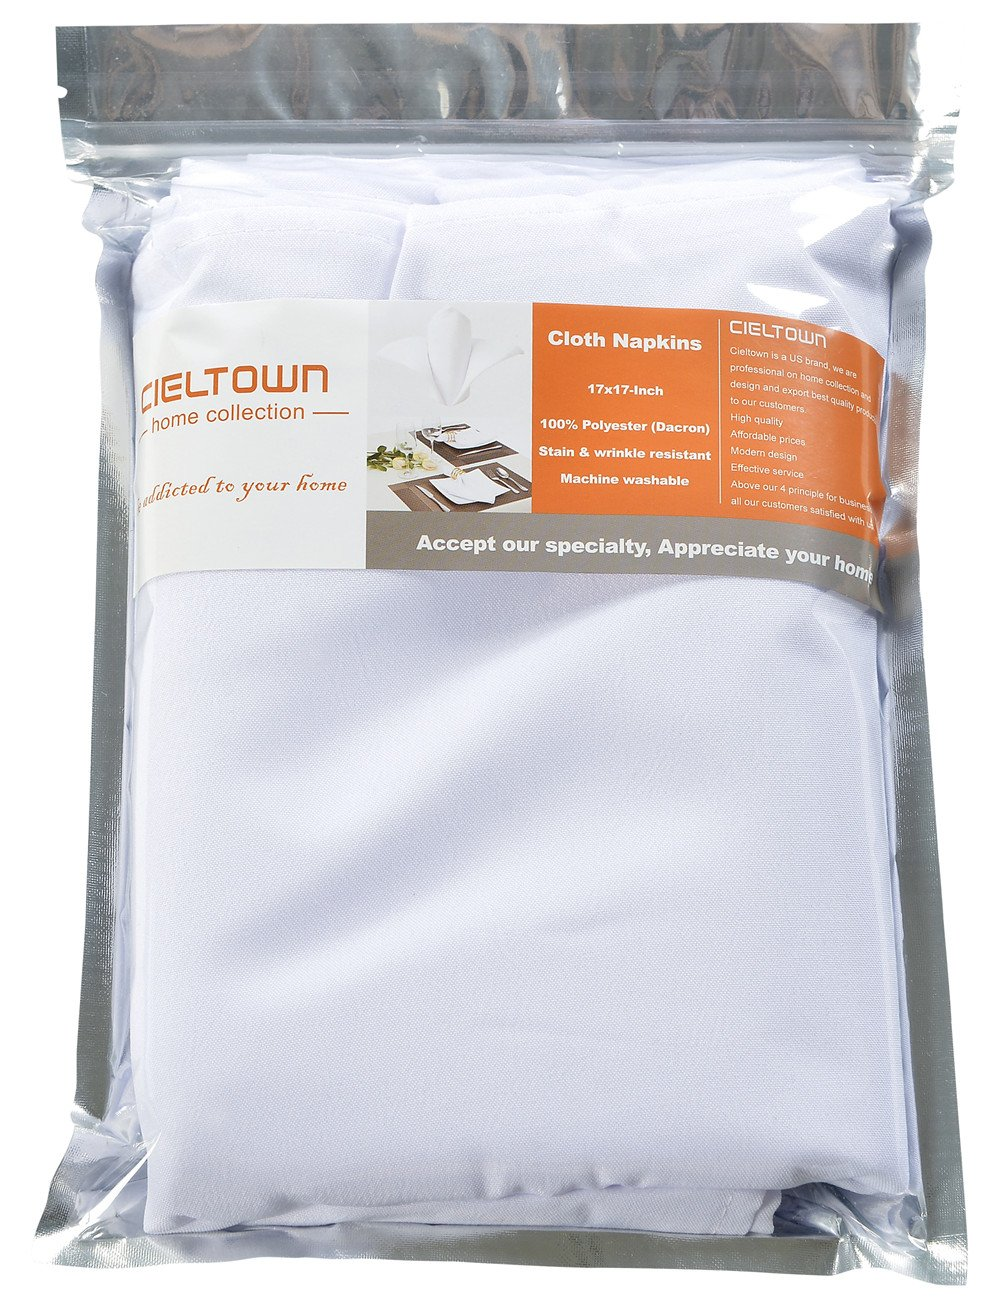 Cieltown Polyester Cloth Napkins 1-Dozen (17 x 17-Inch, white) by cieltown (Image #6)